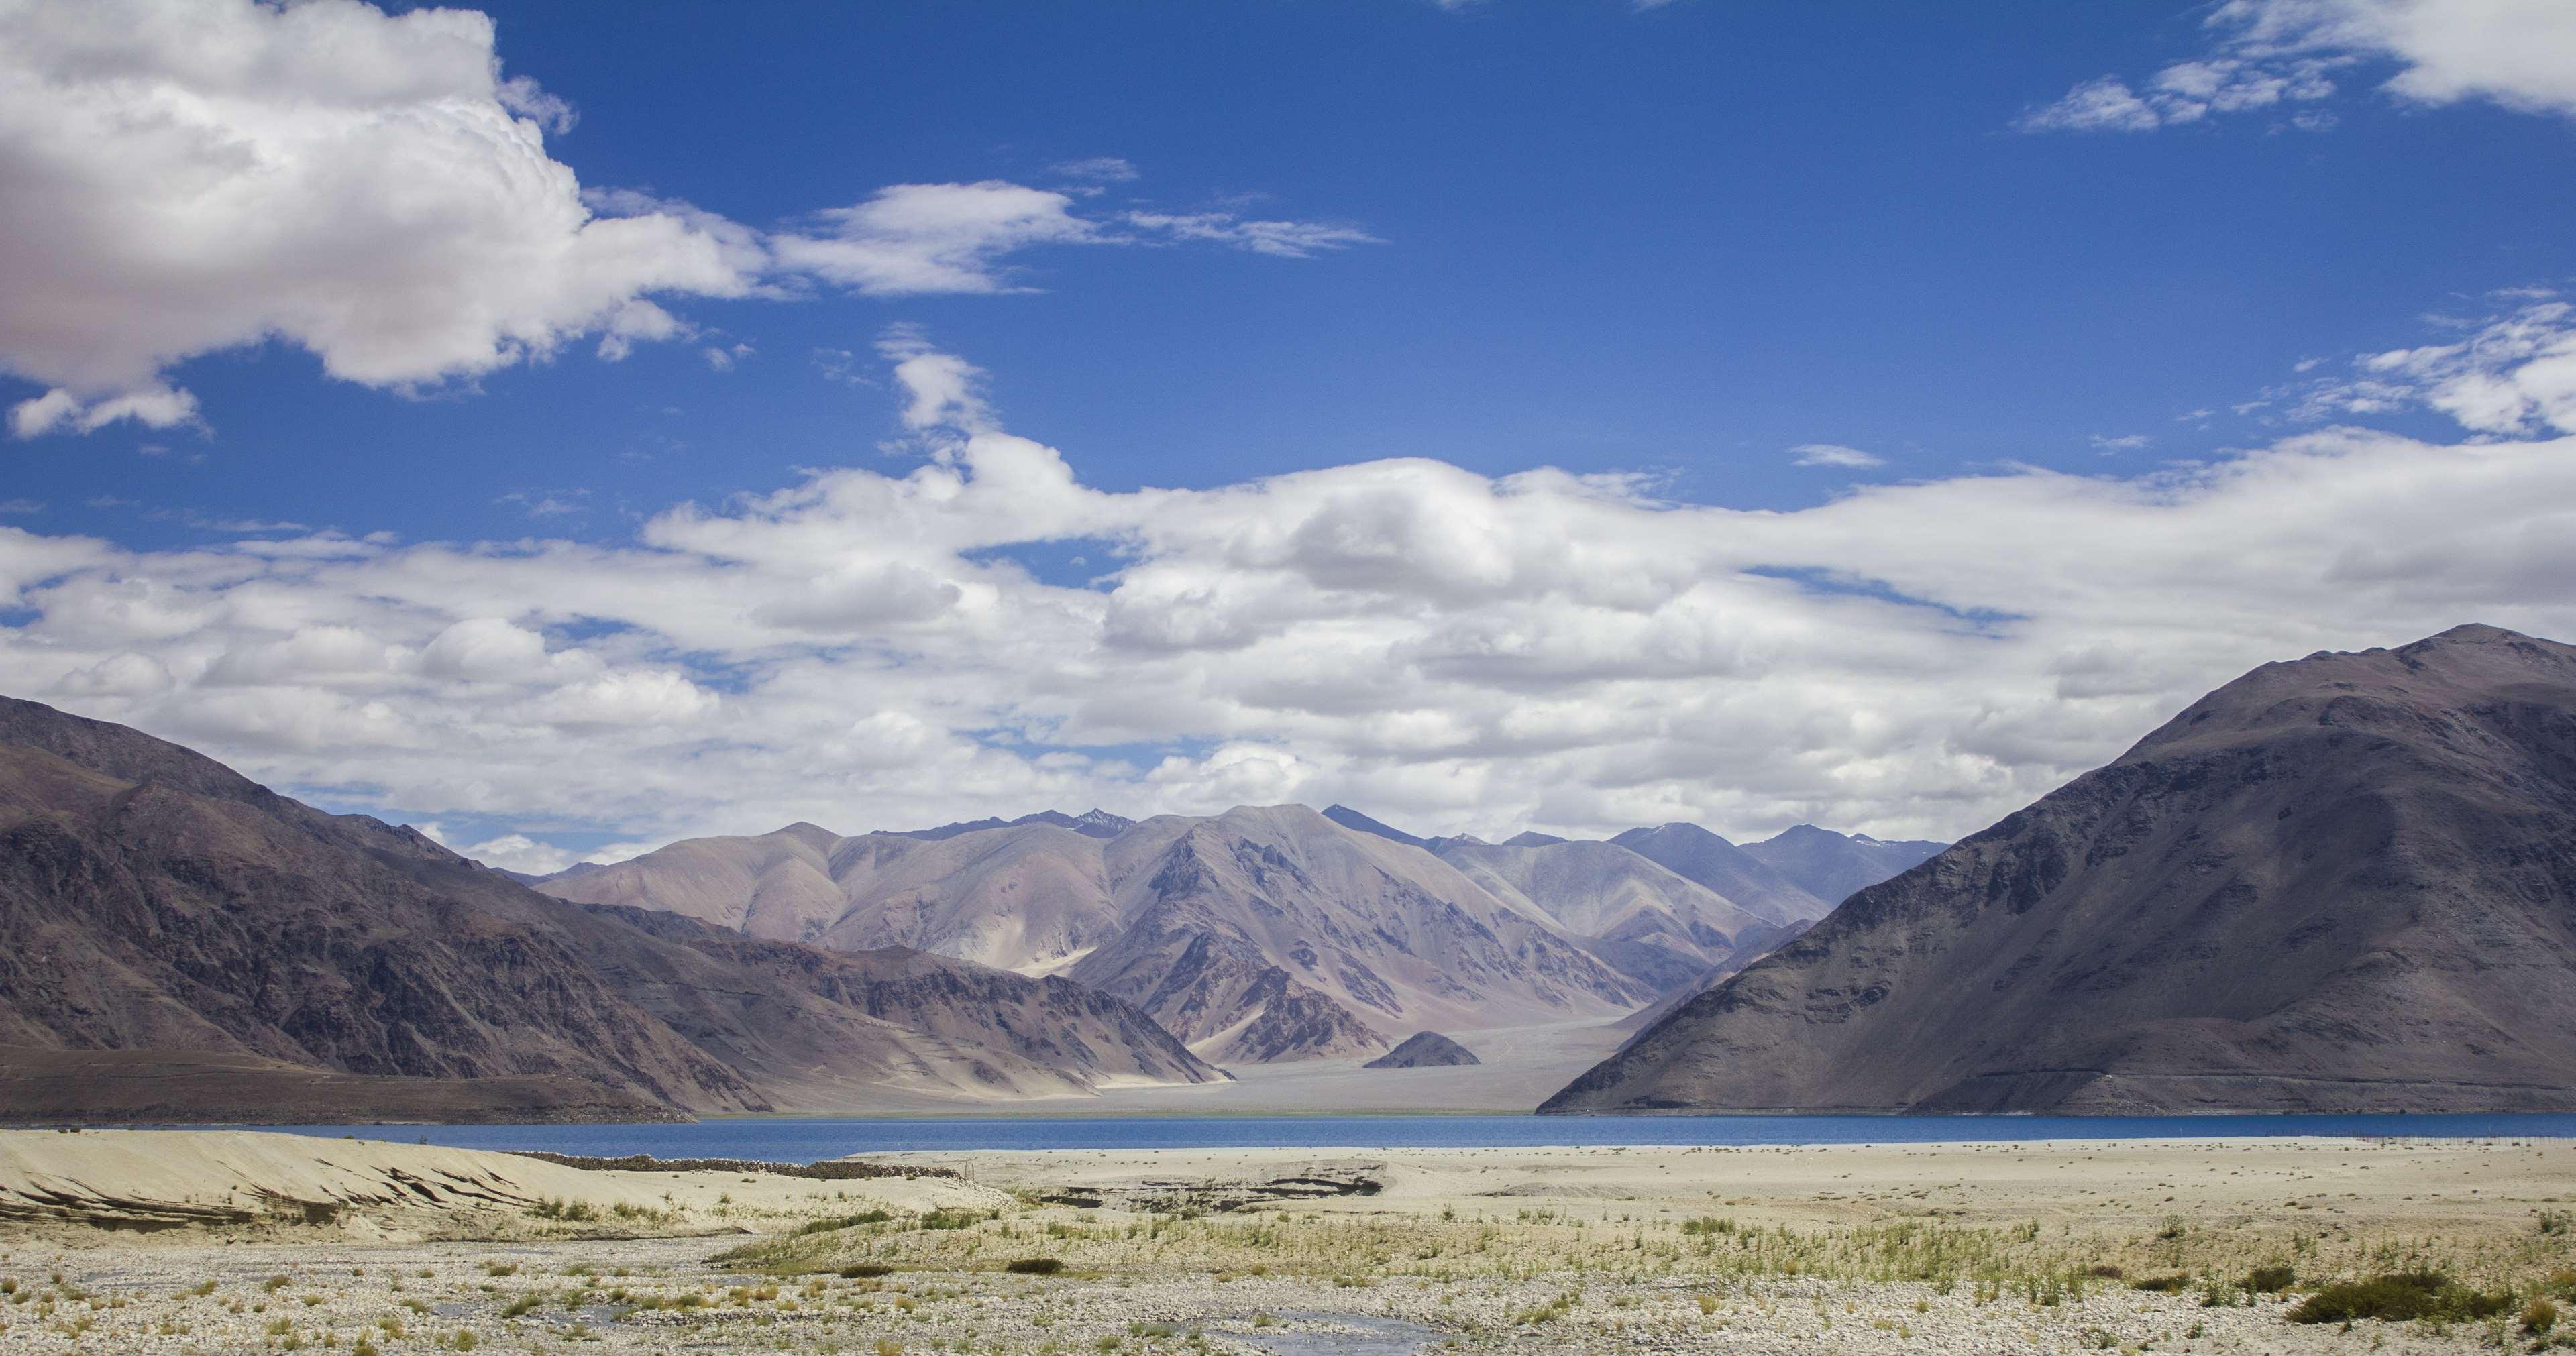 Himalayas Pangonglake Lake Mountains Ladakh 4k Wallpaper - Tesla Black Hole Machine , HD Wallpaper & Backgrounds